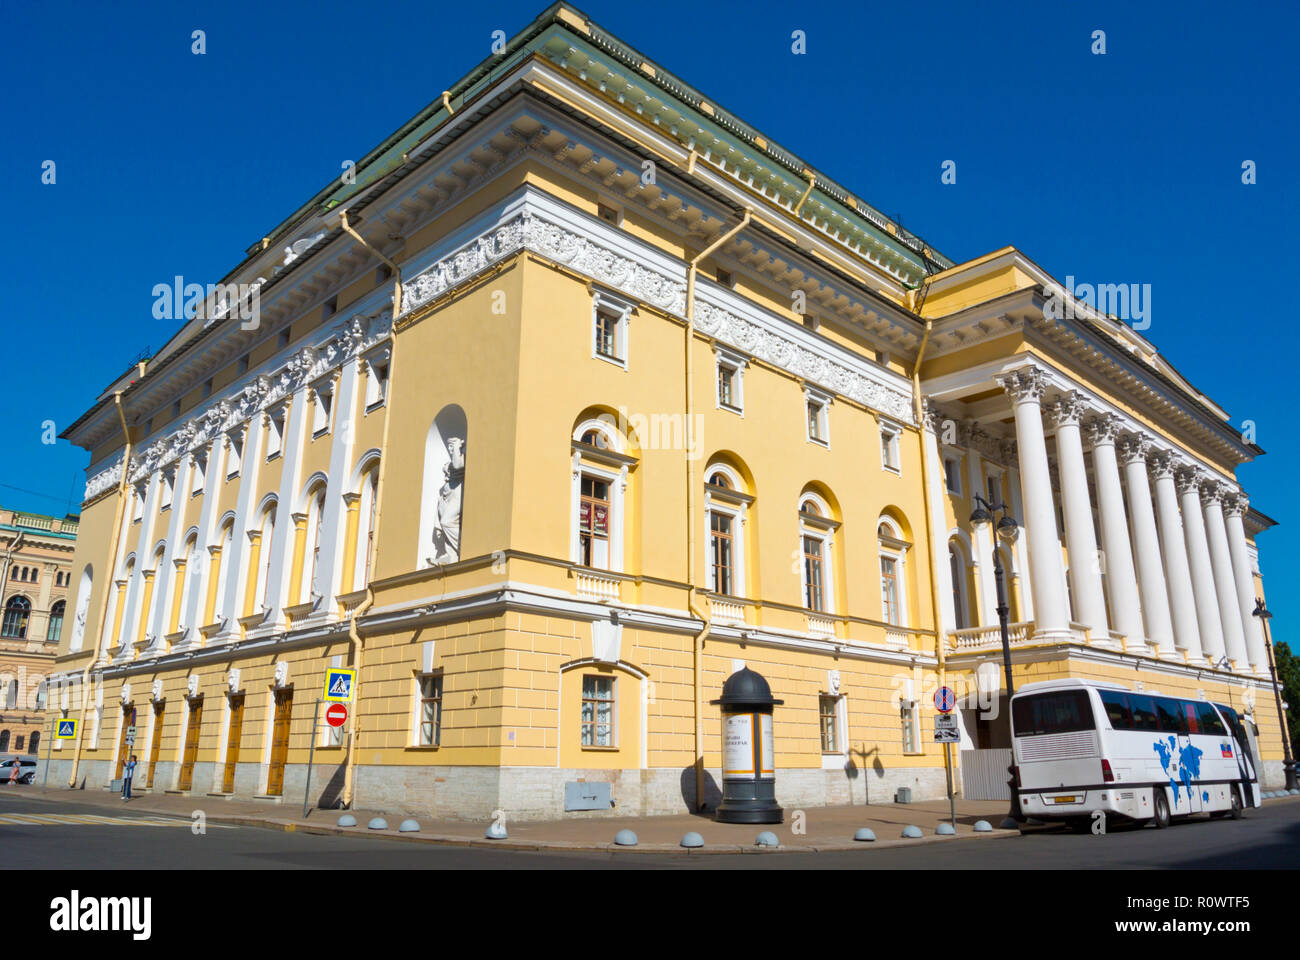 Alexandrinsky Theatre, Saint Petersburg, Russia - Stock Image